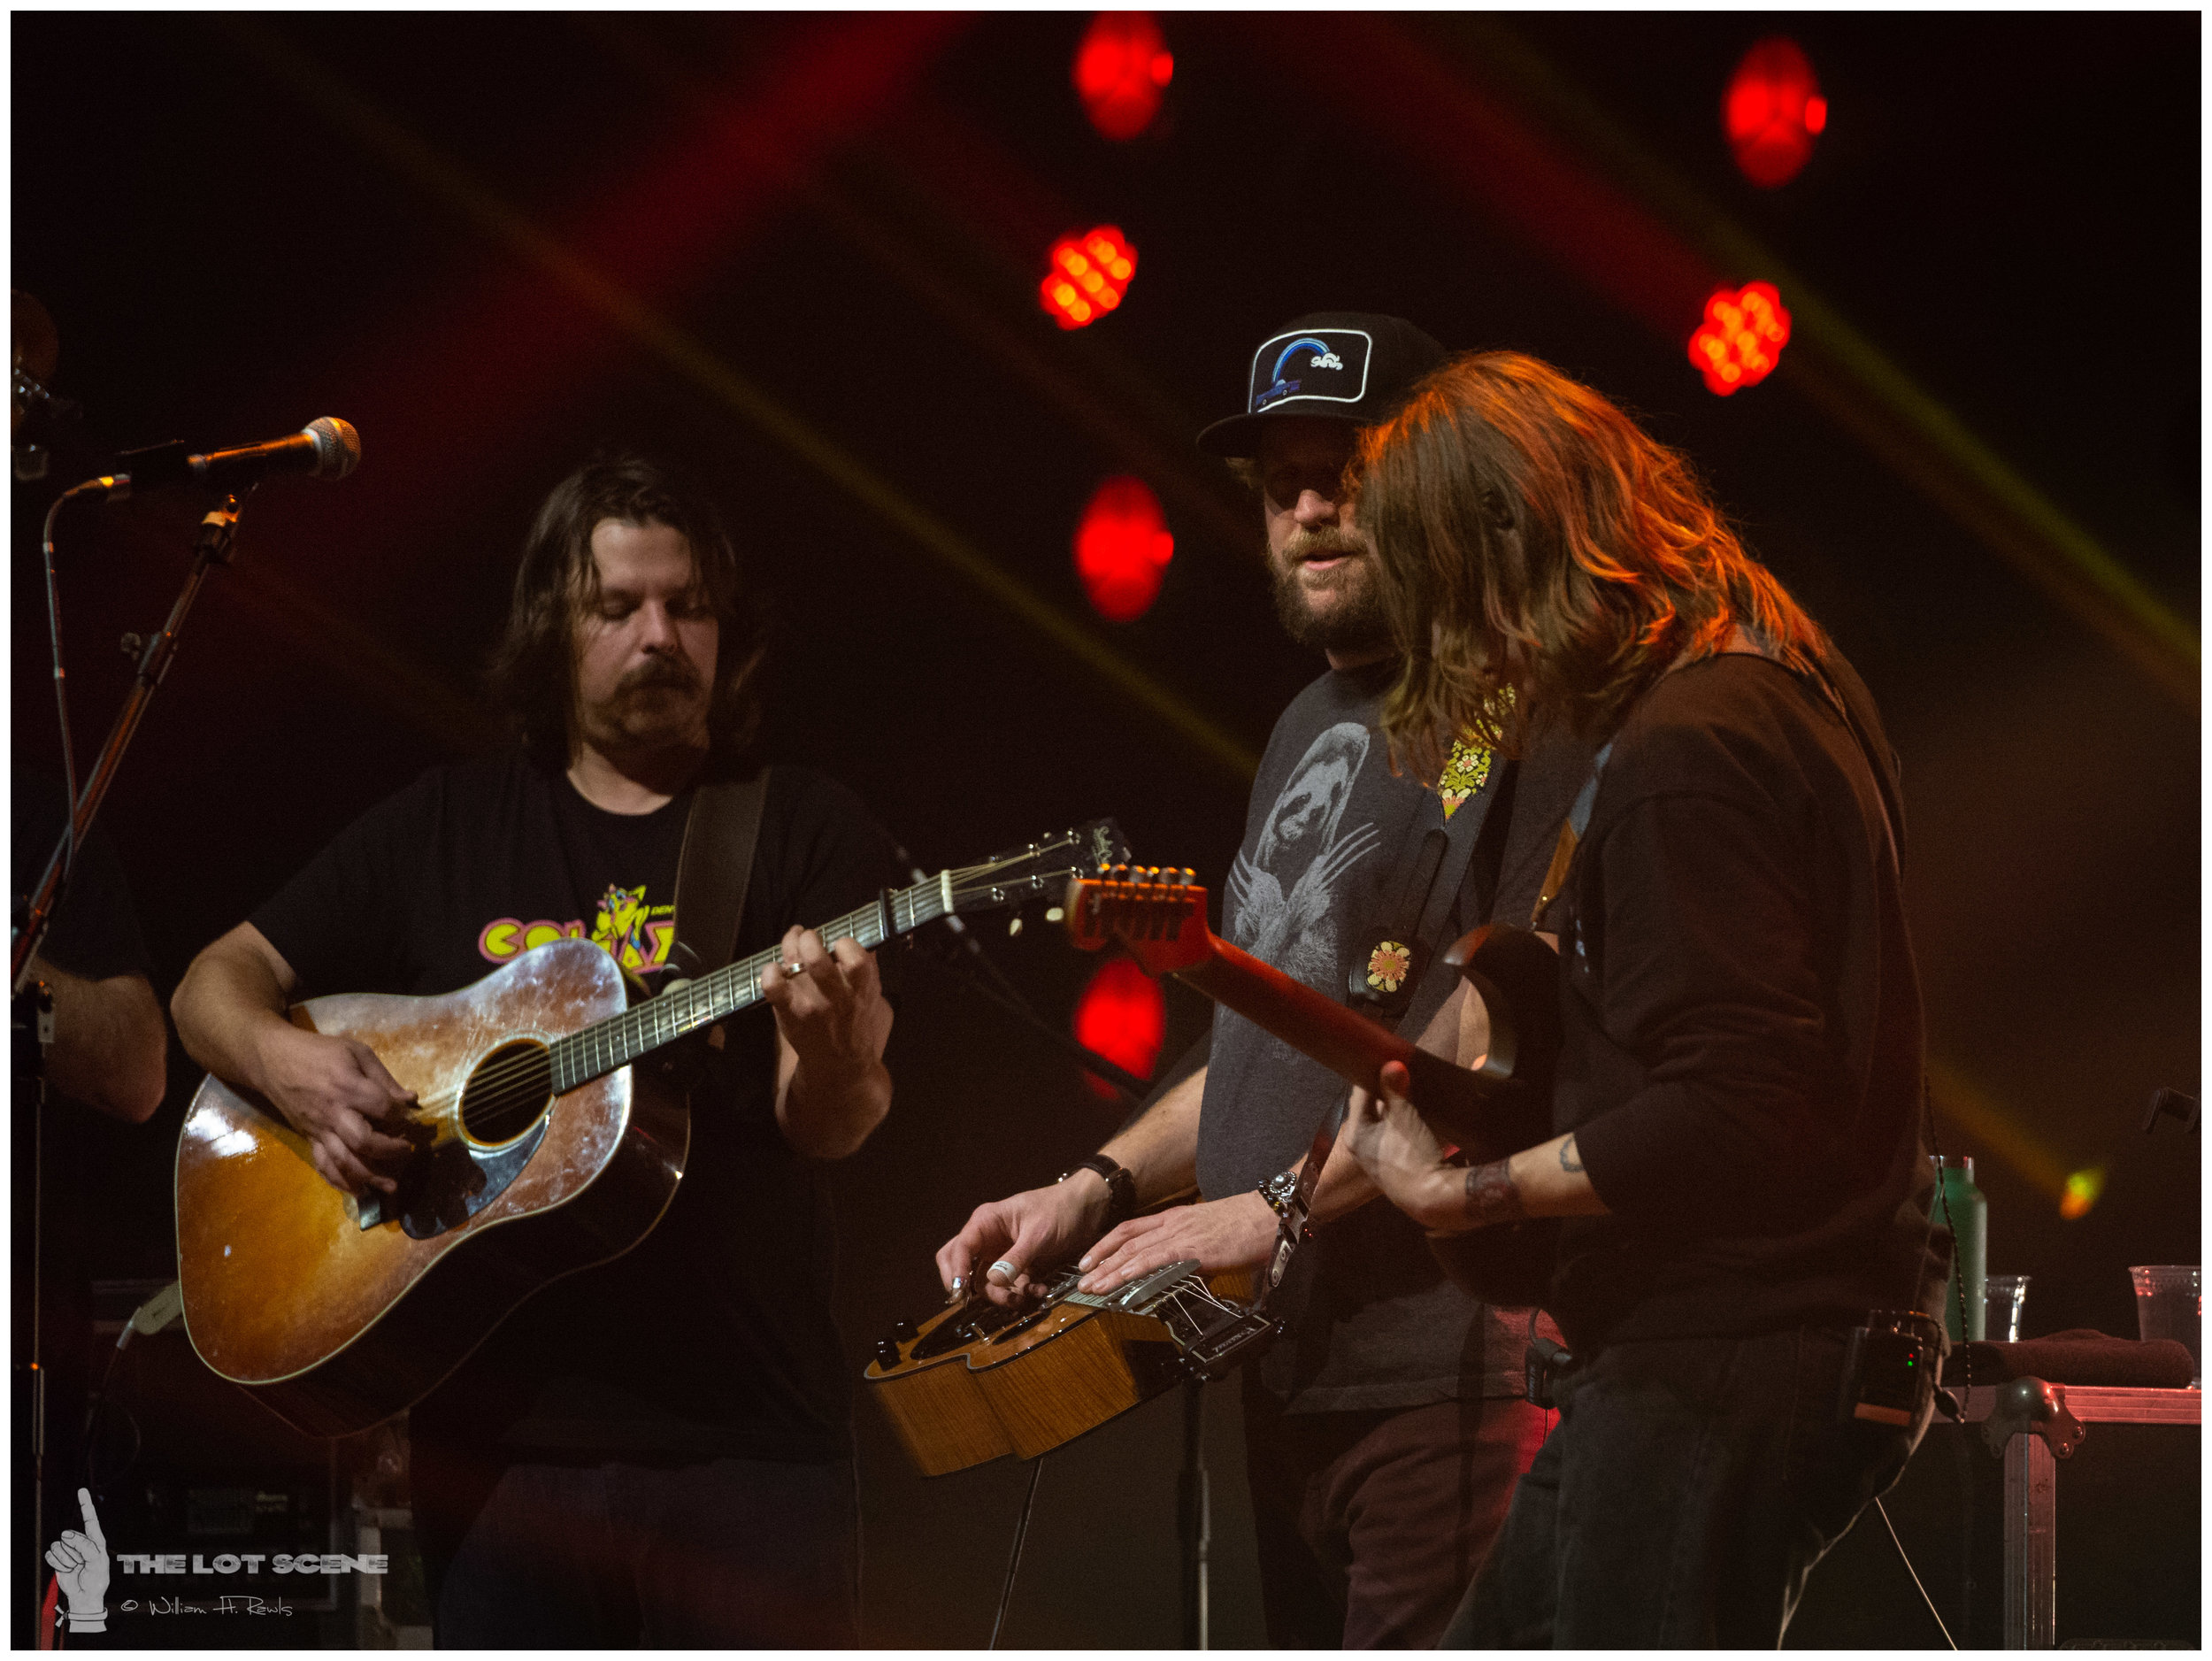 Greensky Bluegrass at The Anthem DC - February 2 2019 - 8.jpg